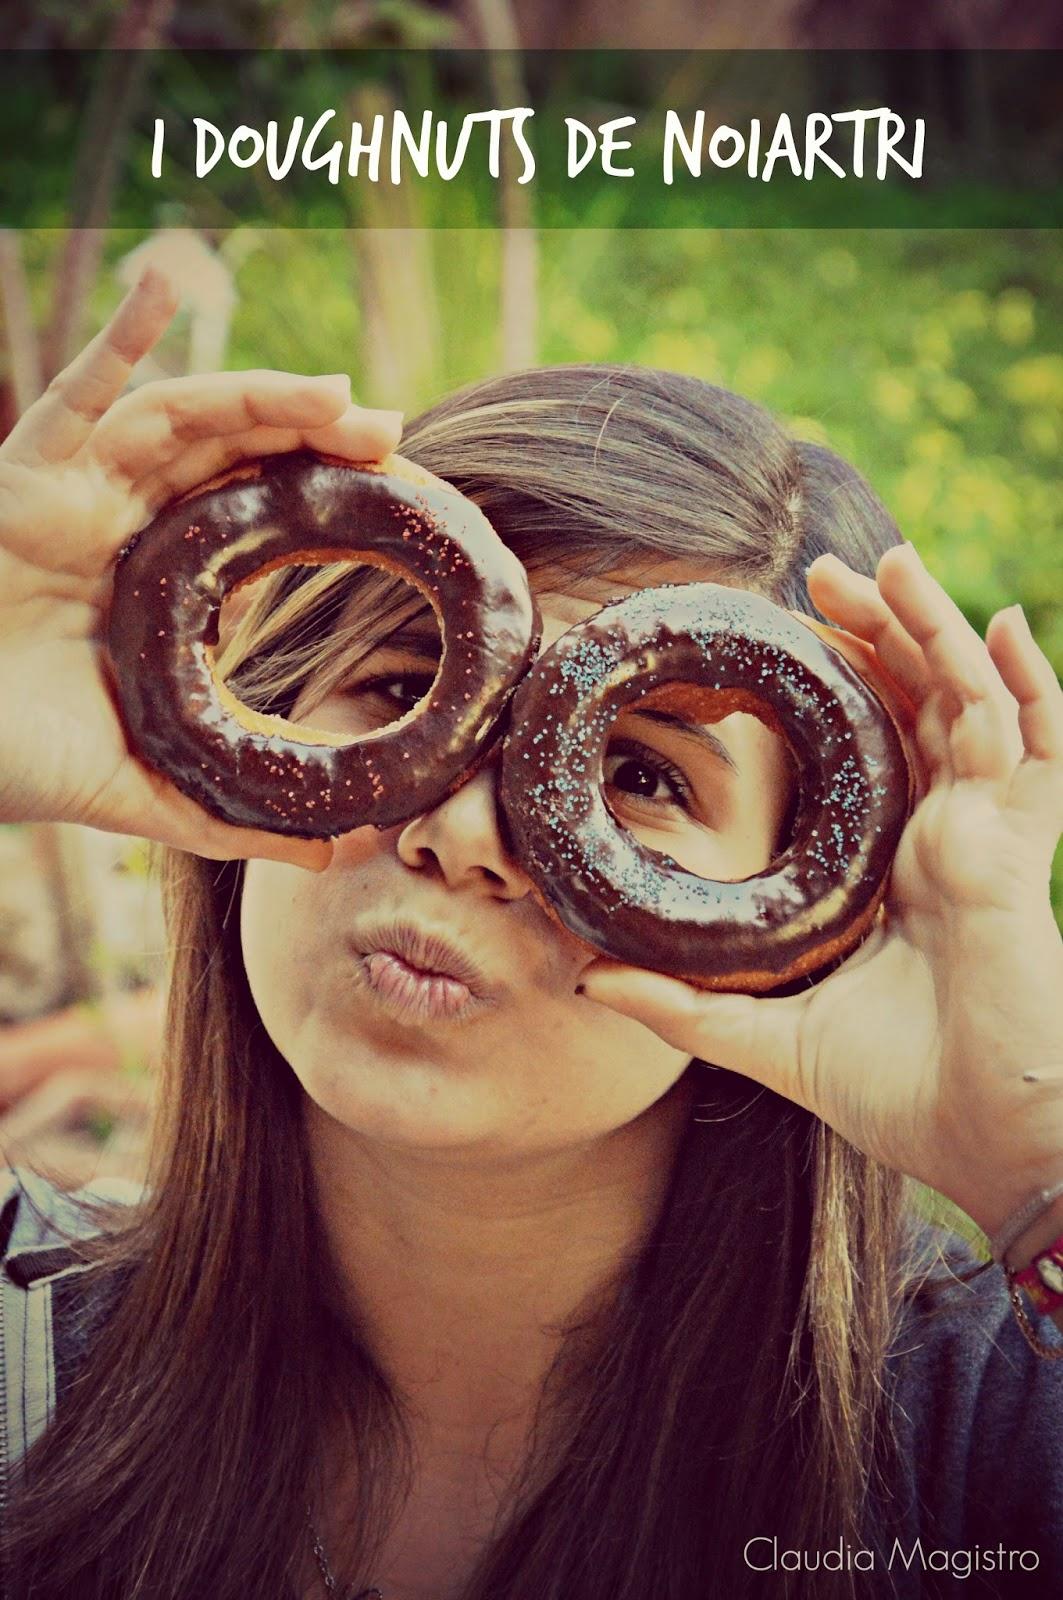 doughnuts-de-noiartri